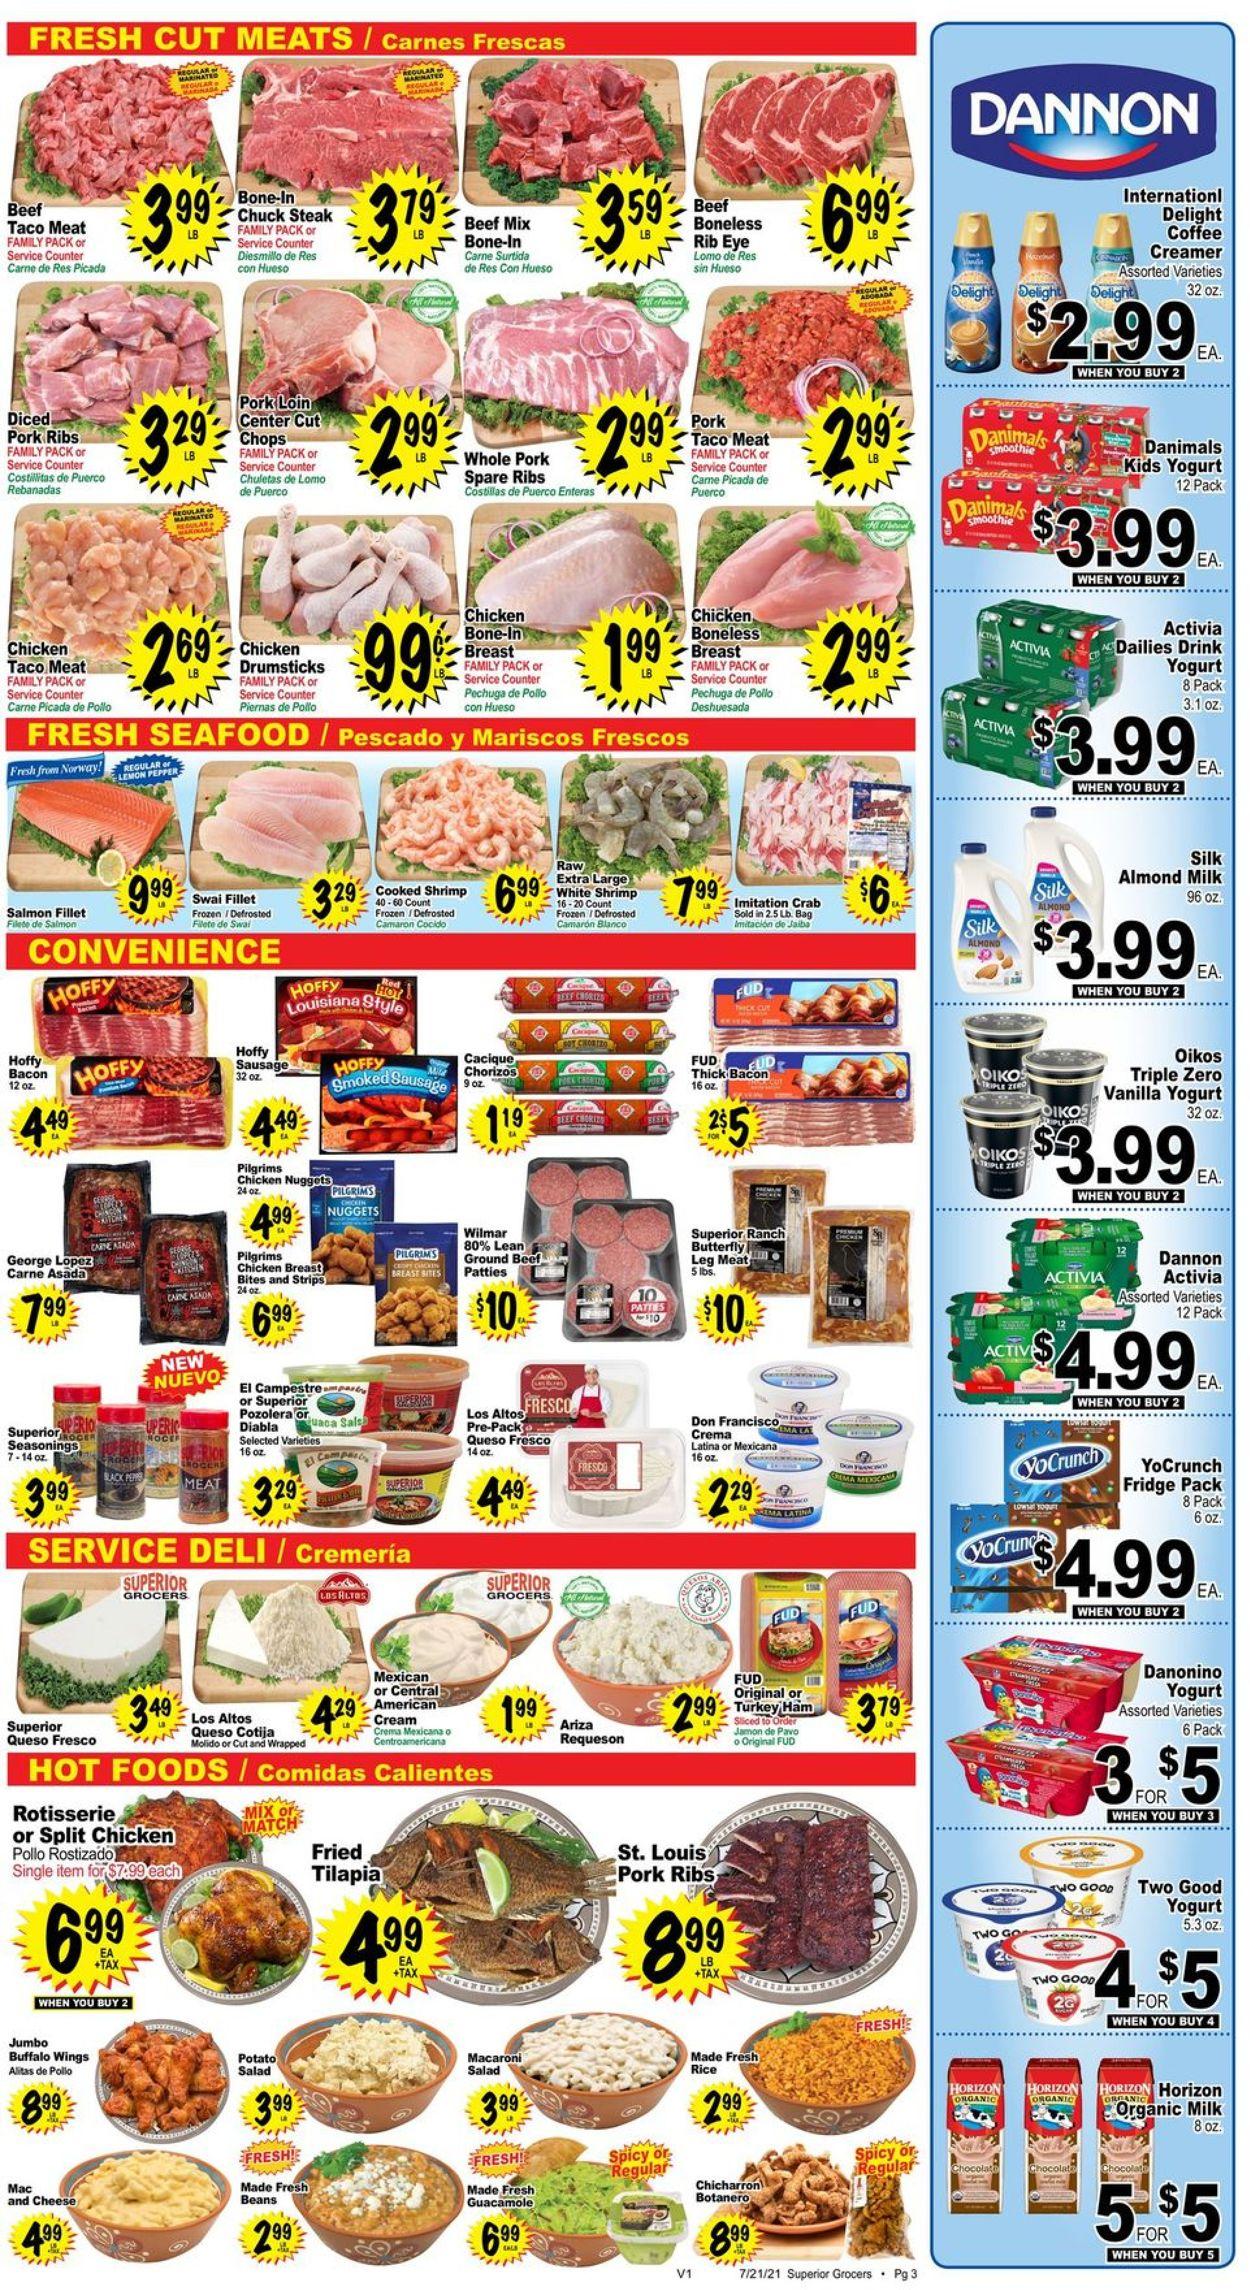 Superior Grocers Weekly Ad Circular - valid 07/21-07/27/2021 (Page 3)